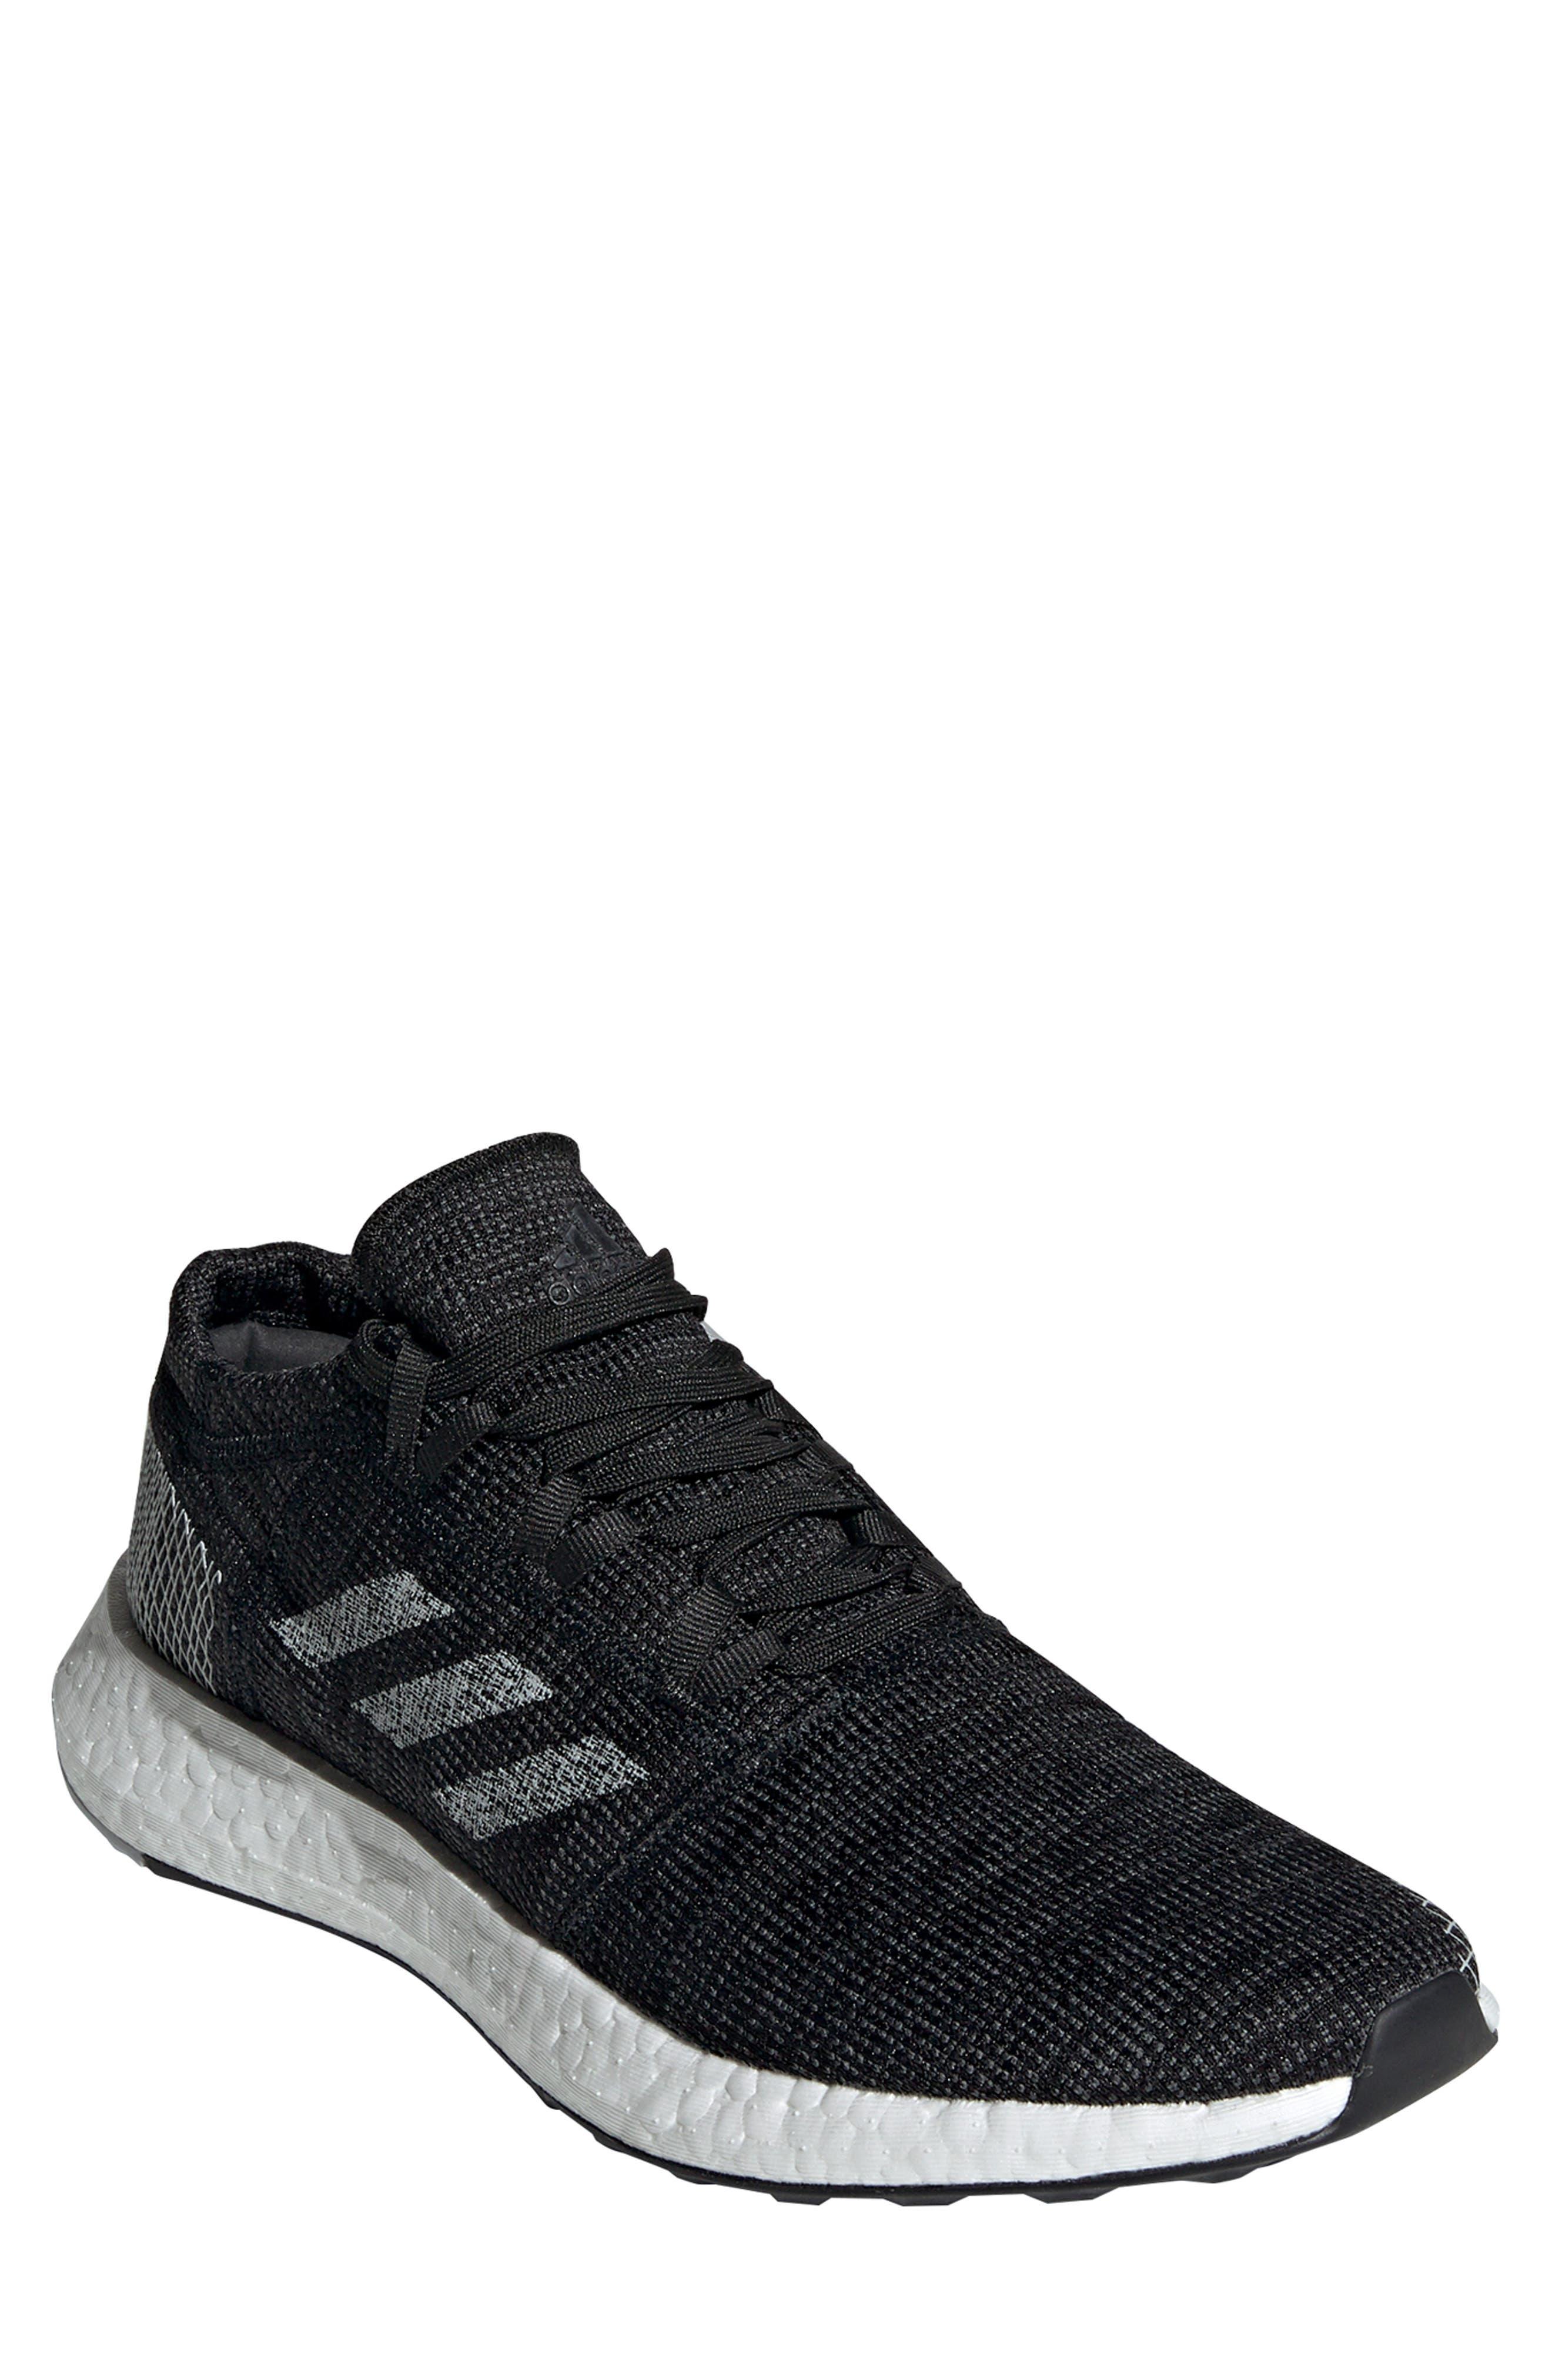 ADIDAS PureBoost Go Running Shoe, Main, color, CORE BLACK/ GREY